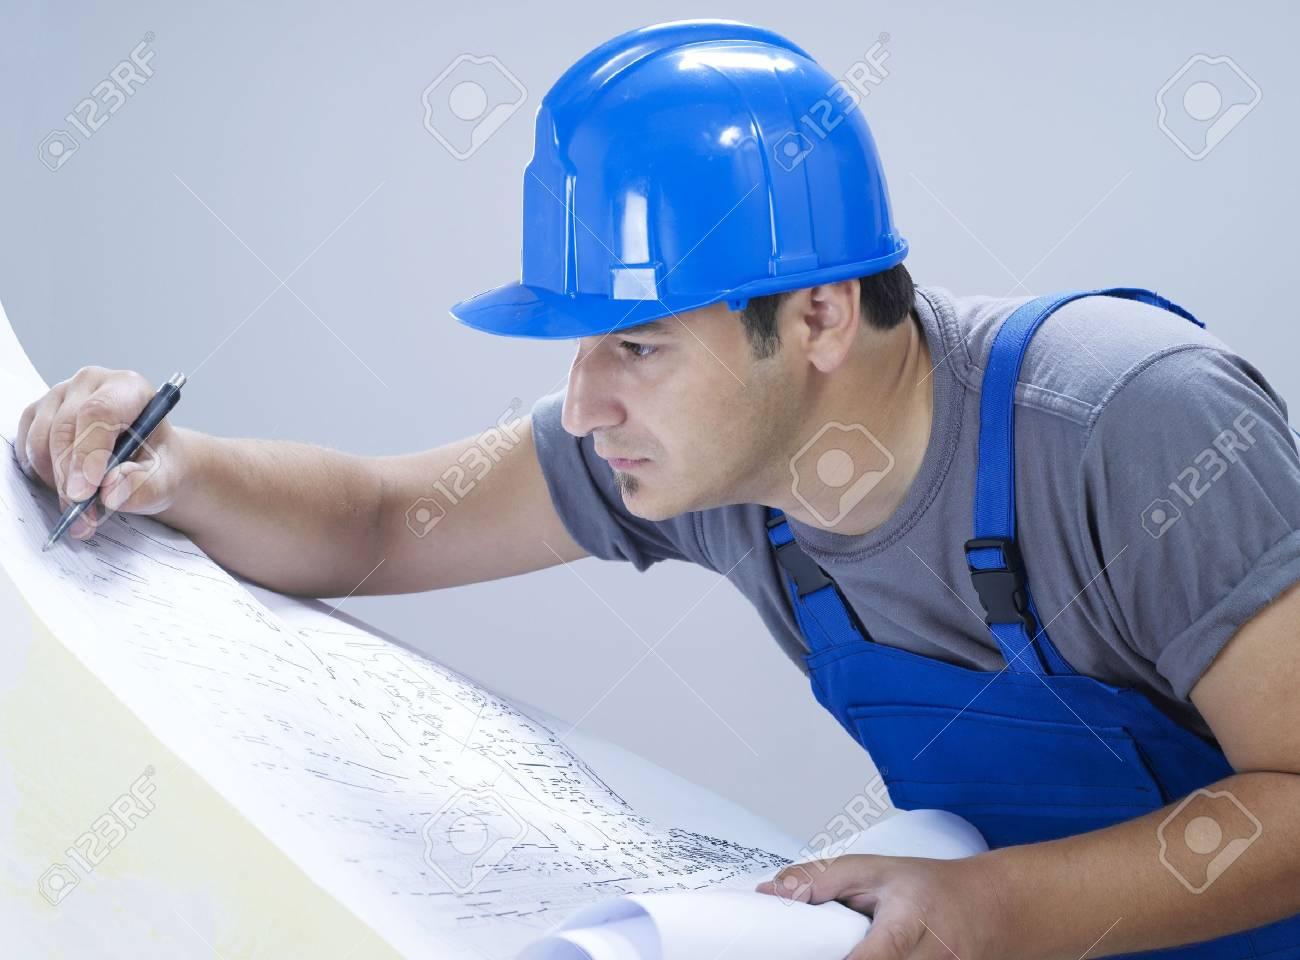 Construction series Stock Photo - 2290875